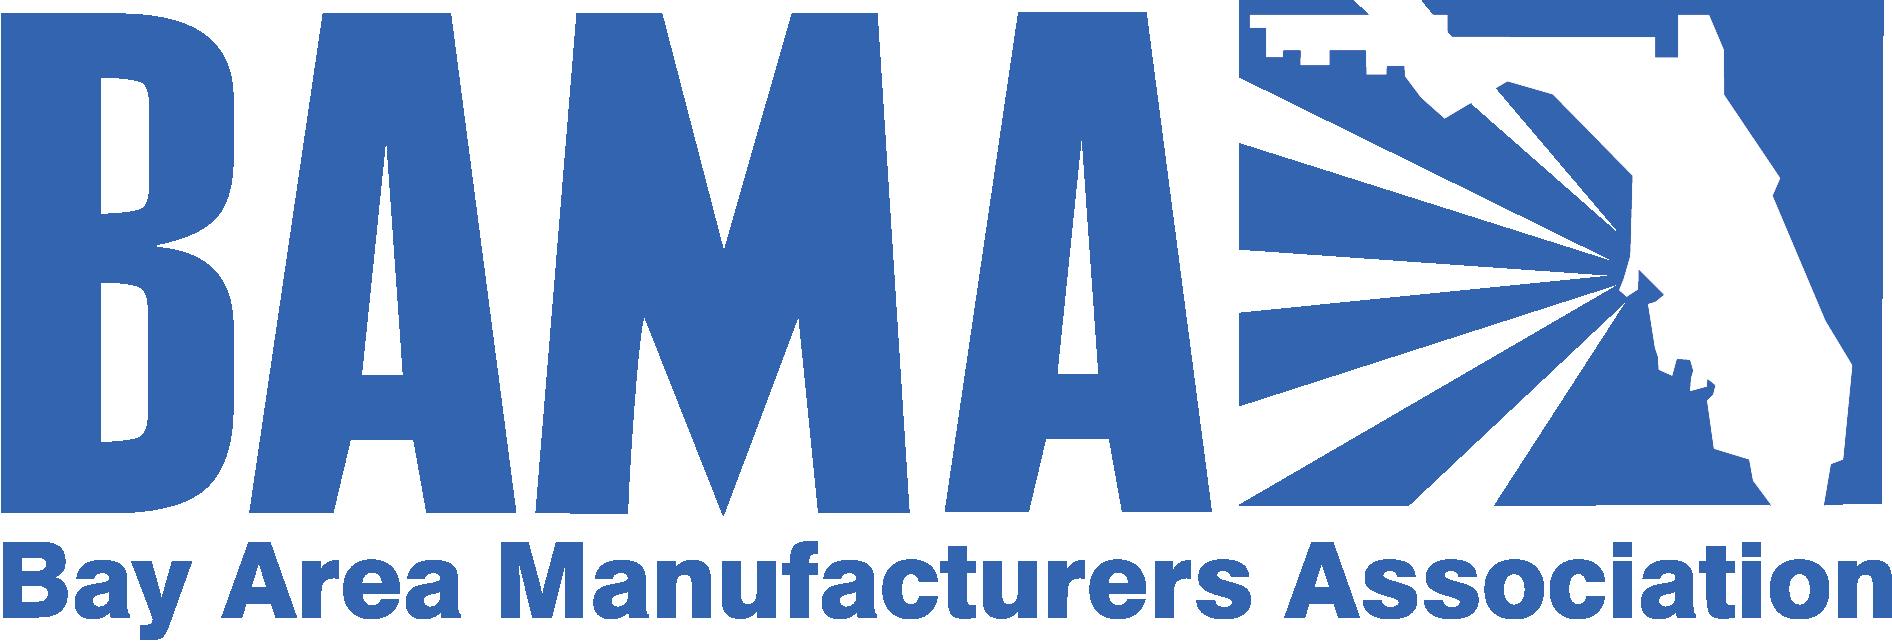 bay area manufacturers association a discussion on the supply bay area manufacturers association a discussion on the supply chain talent gap careers leadership